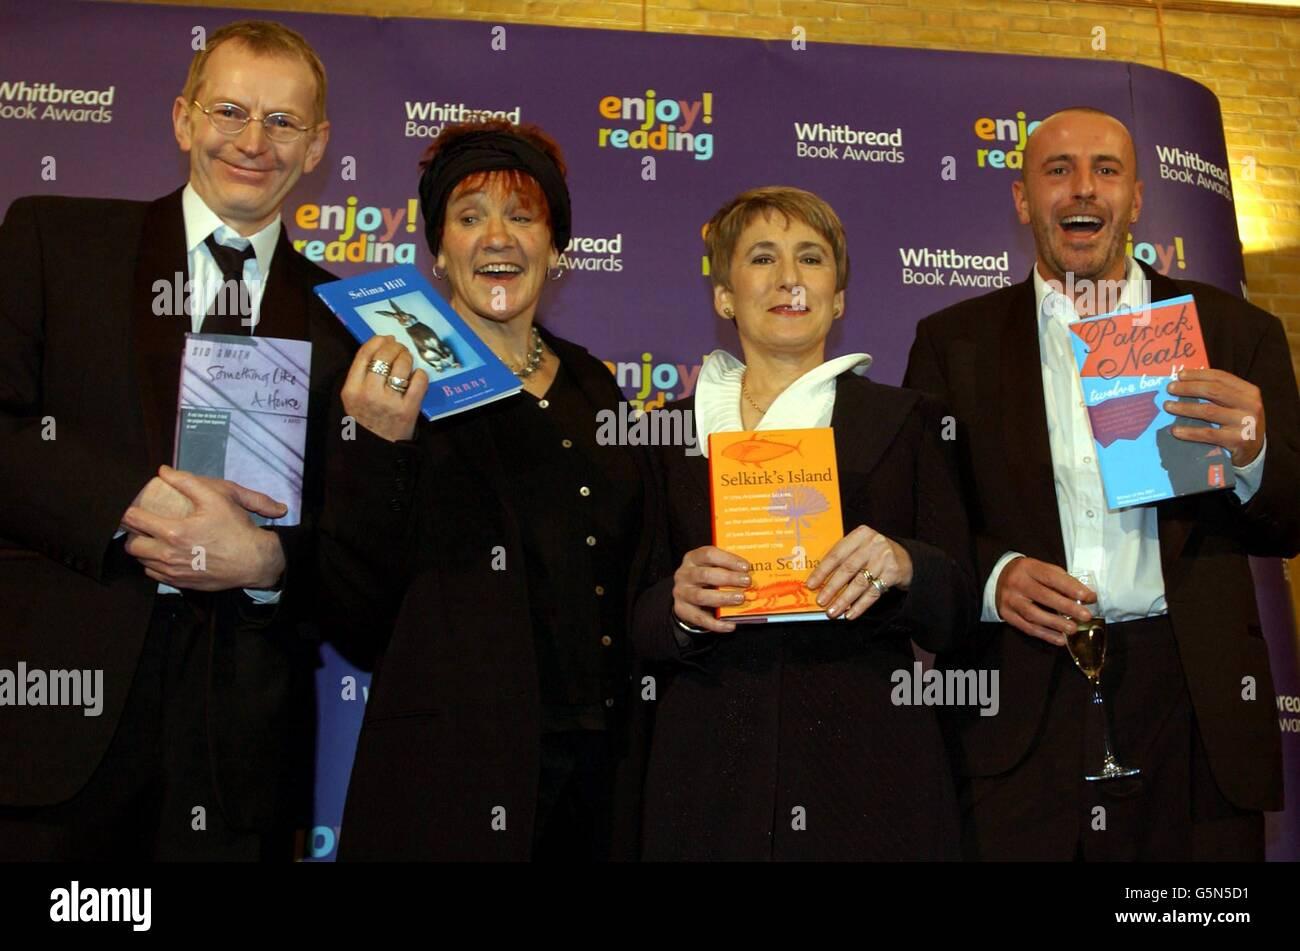 Whitbread Book Awards Authors Stock Photo